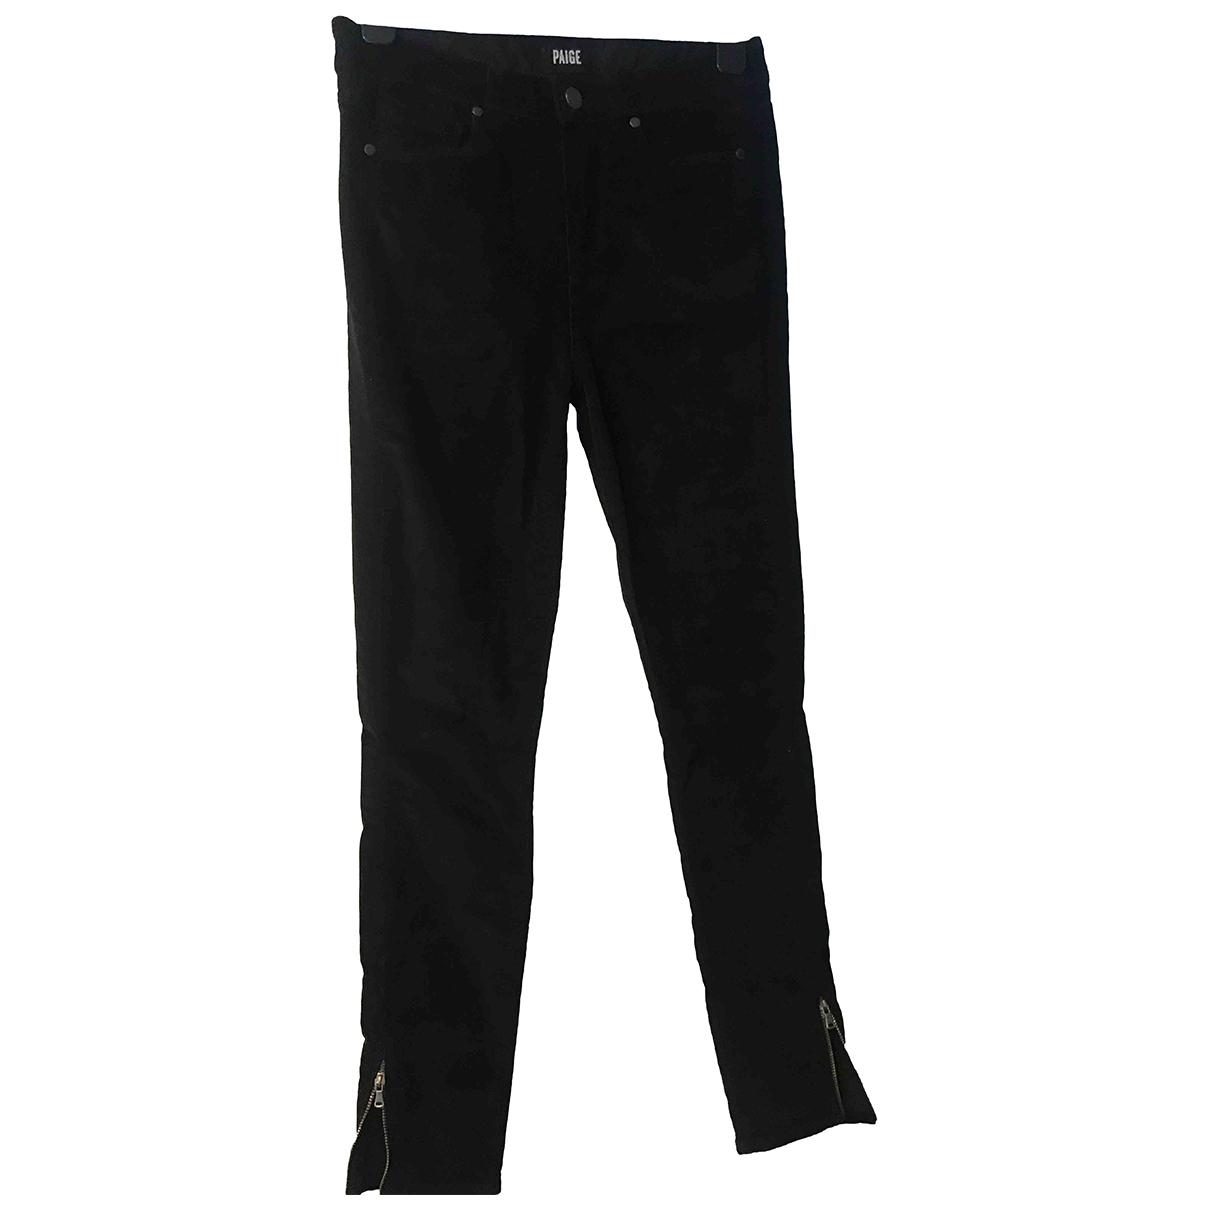 Paige Jeans \N Black Cotton - elasthane Jeans for Women 27 US